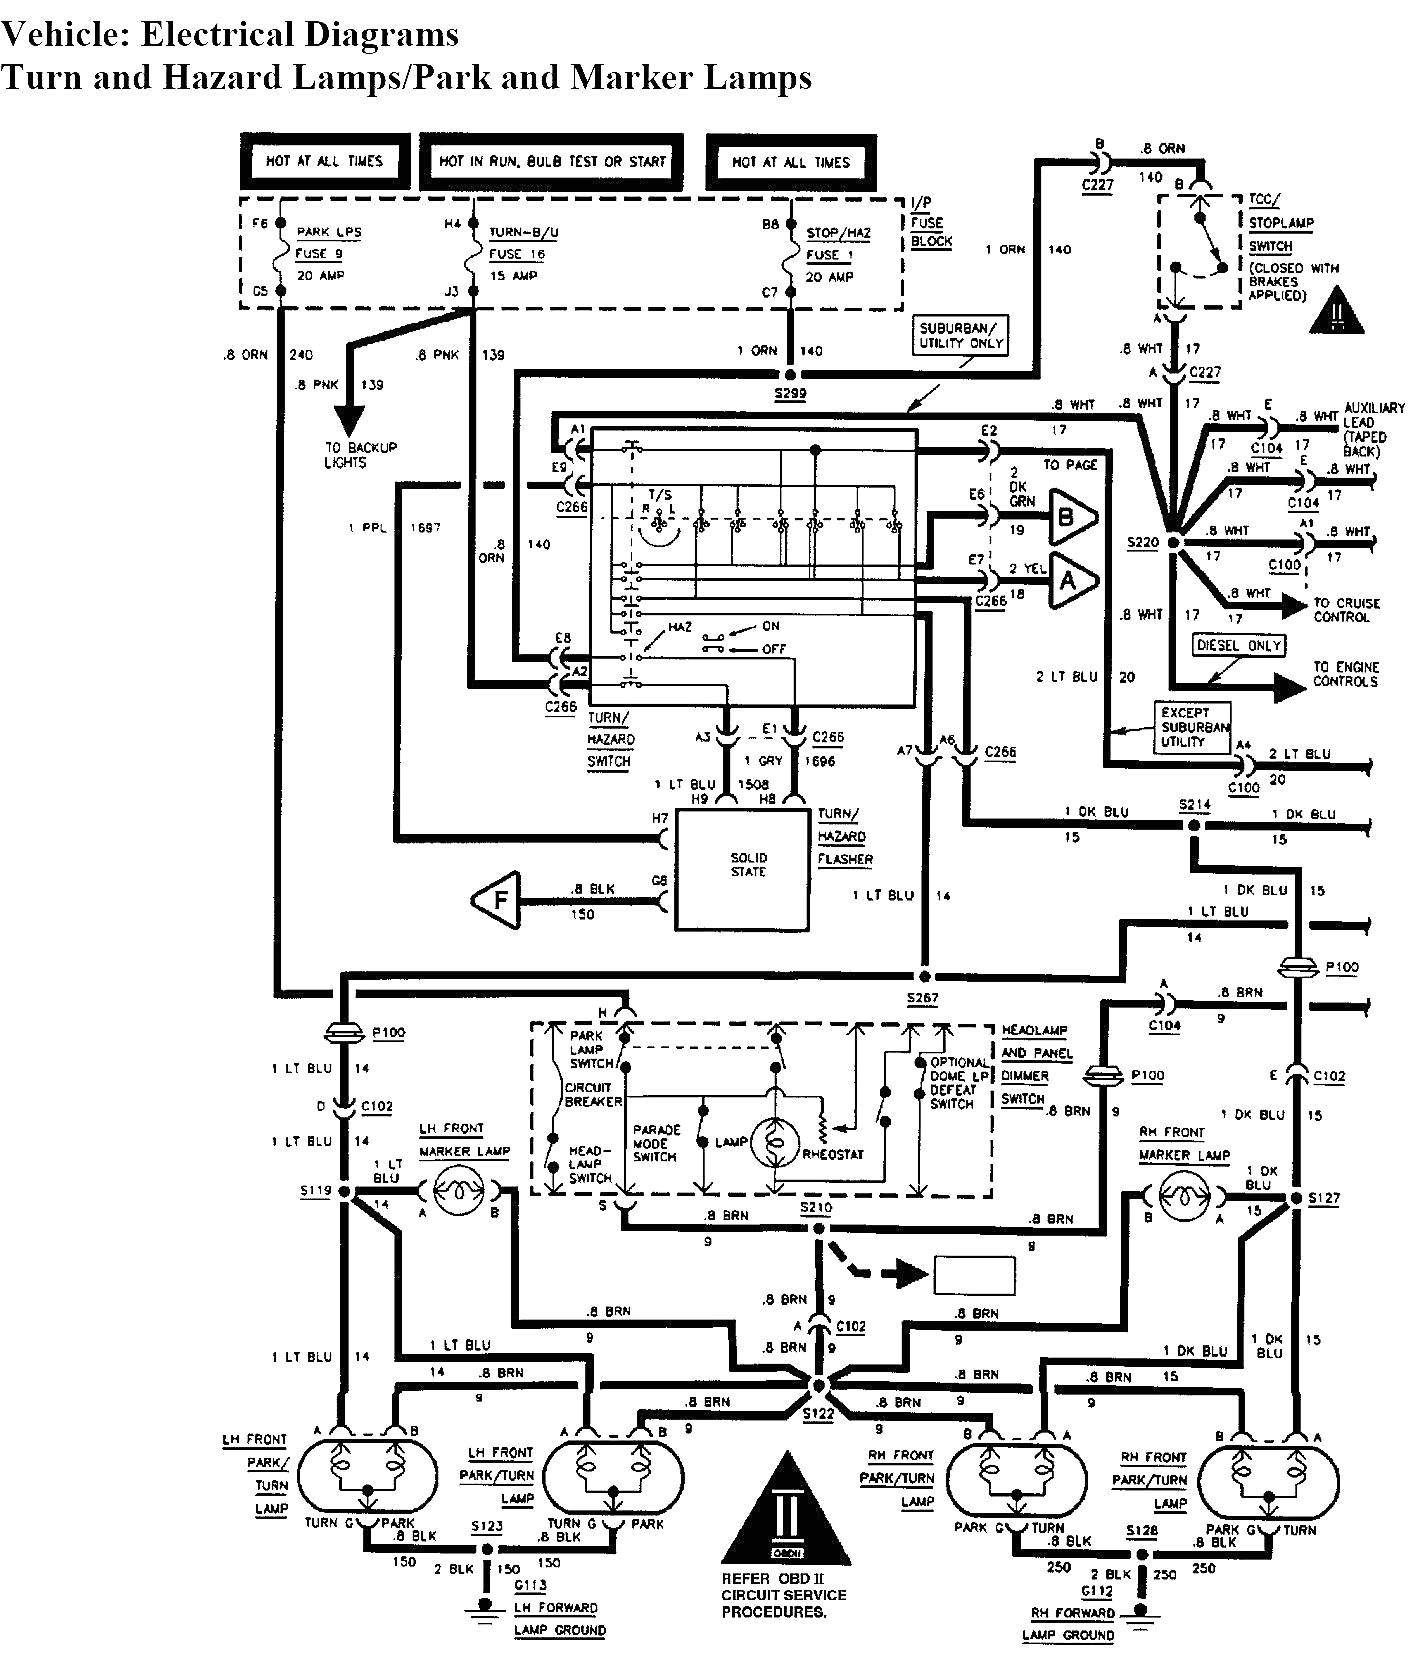 2003 chevy silverado tail light wiring diagram wiring diagram database wiring diagram 06 chevy silverado